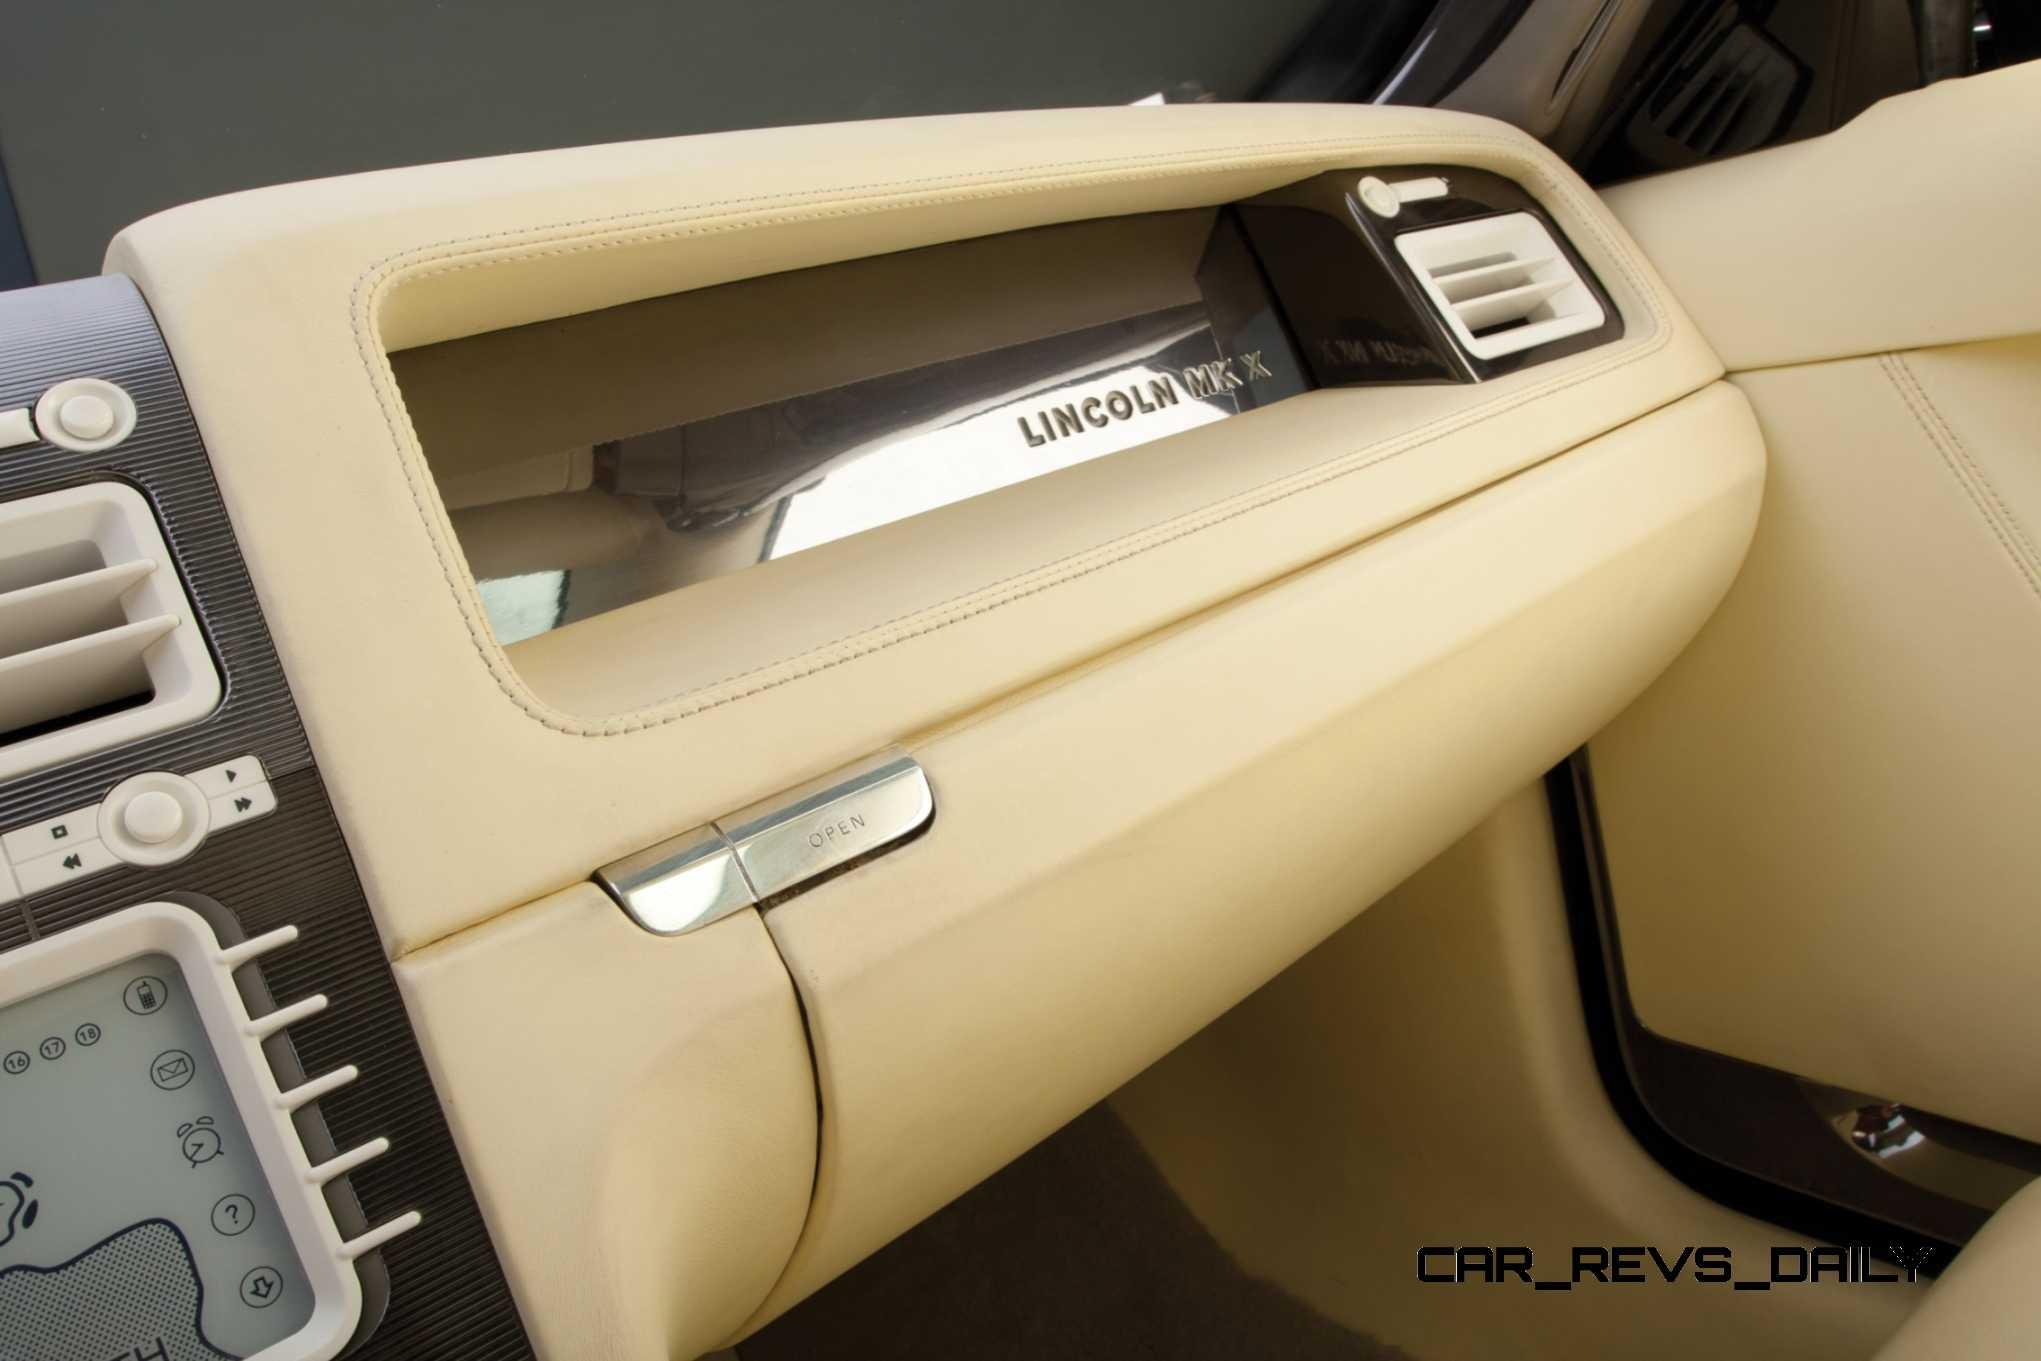 http://www.car-revs-daily.com/wp-content/uploads/2014/10/2004-Lincoln-Mark-X-Concept-16.jpg